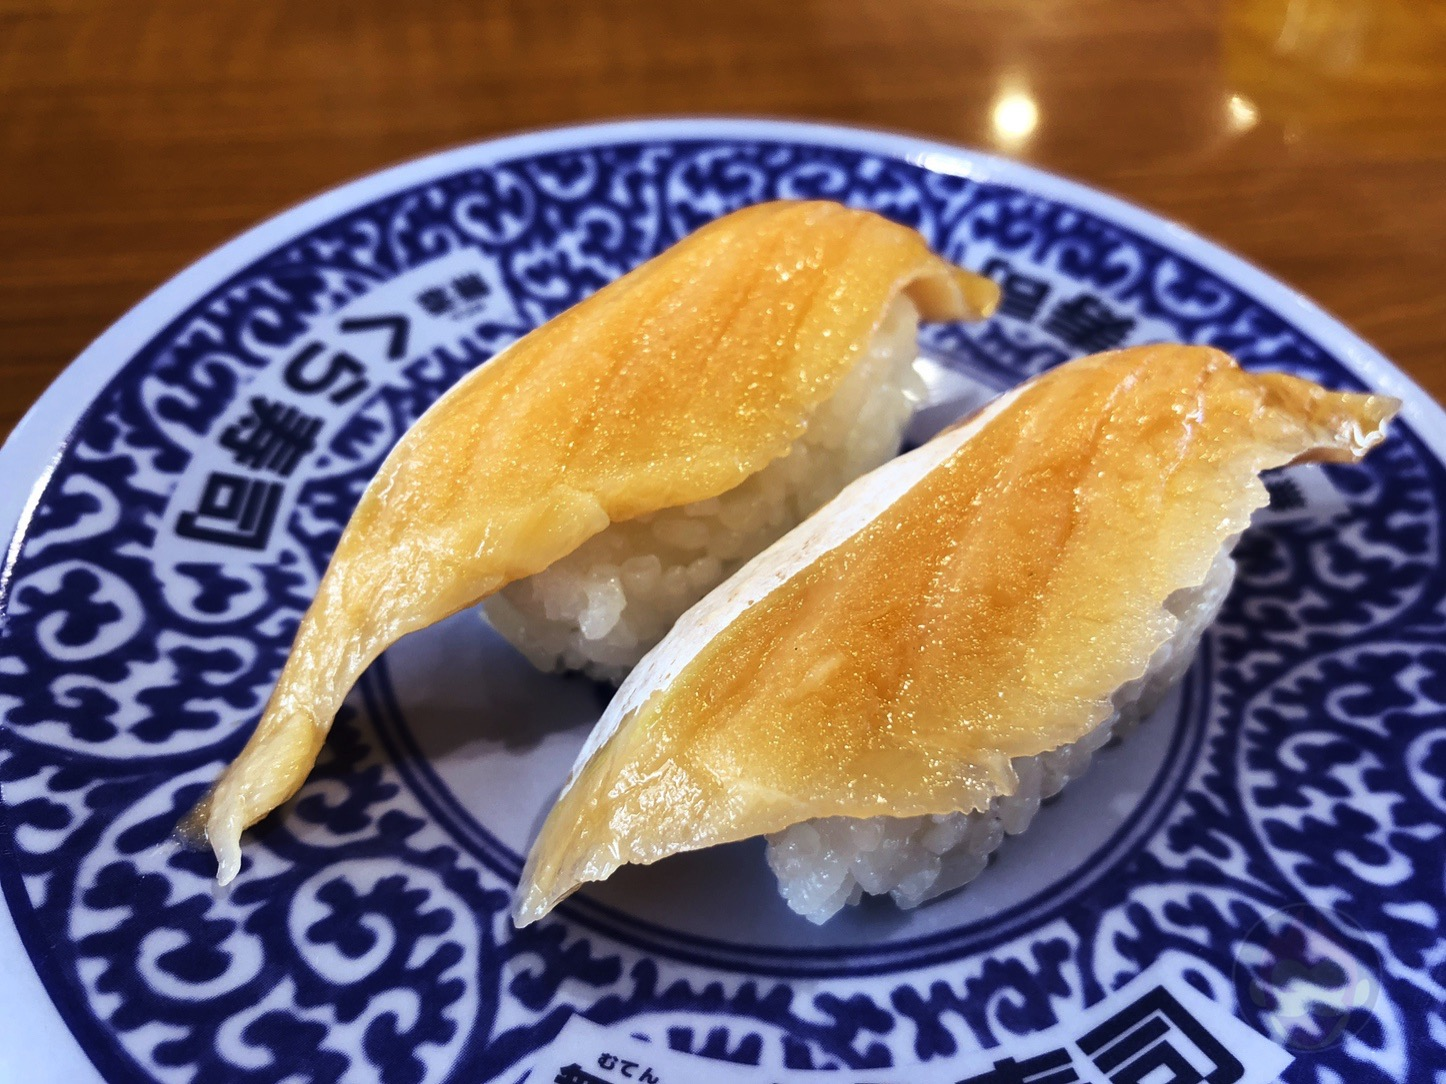 Kurazushi Strange but tasety menus 03